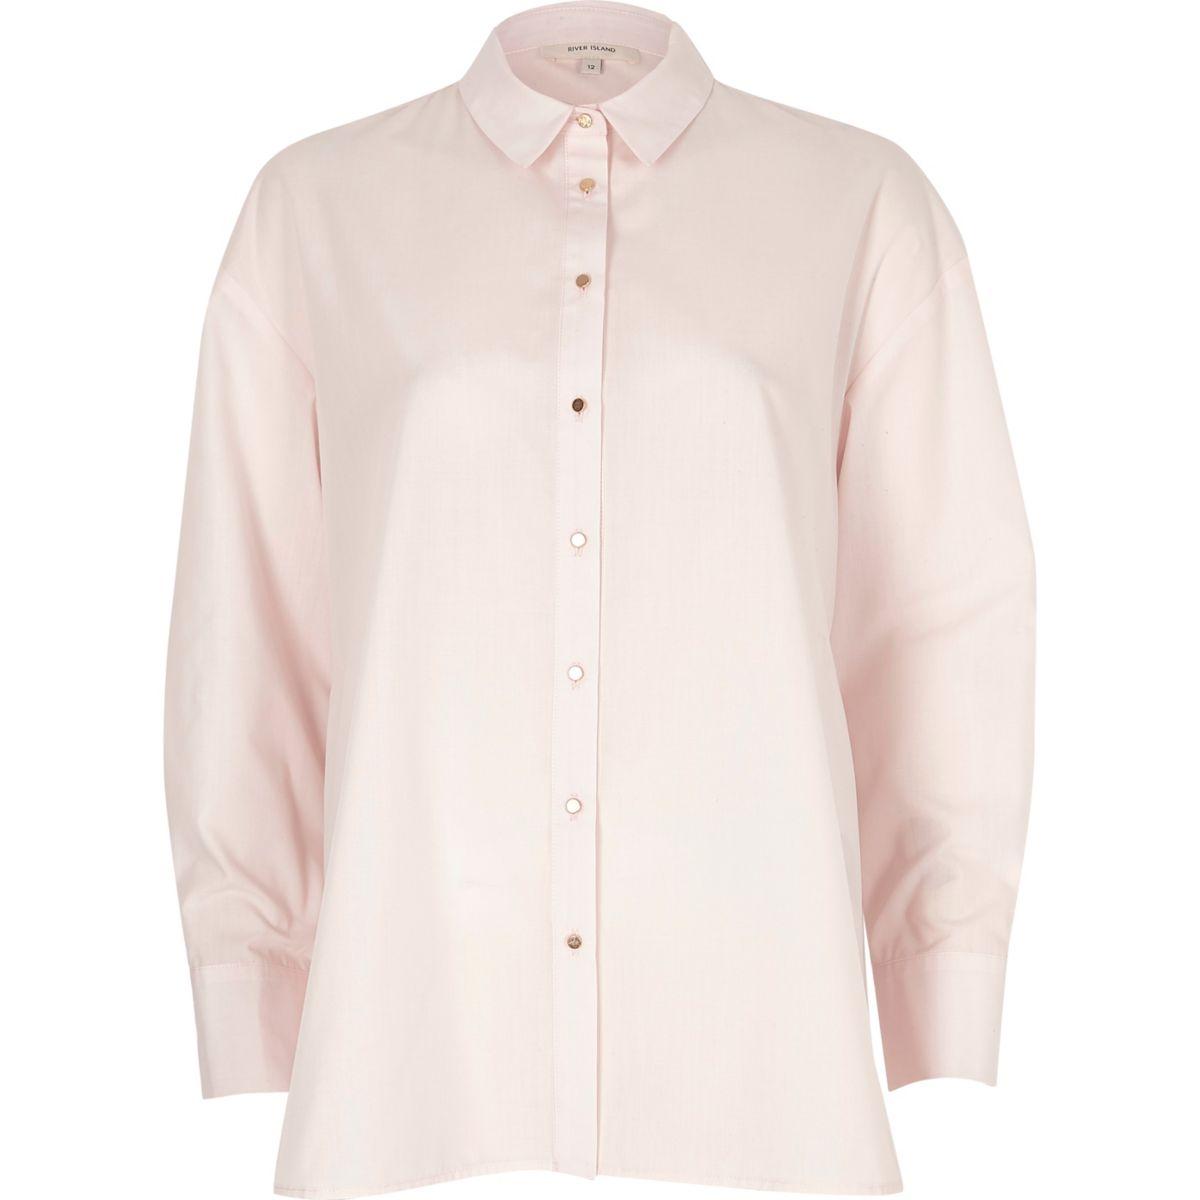 Light pink tie back oversized shirt